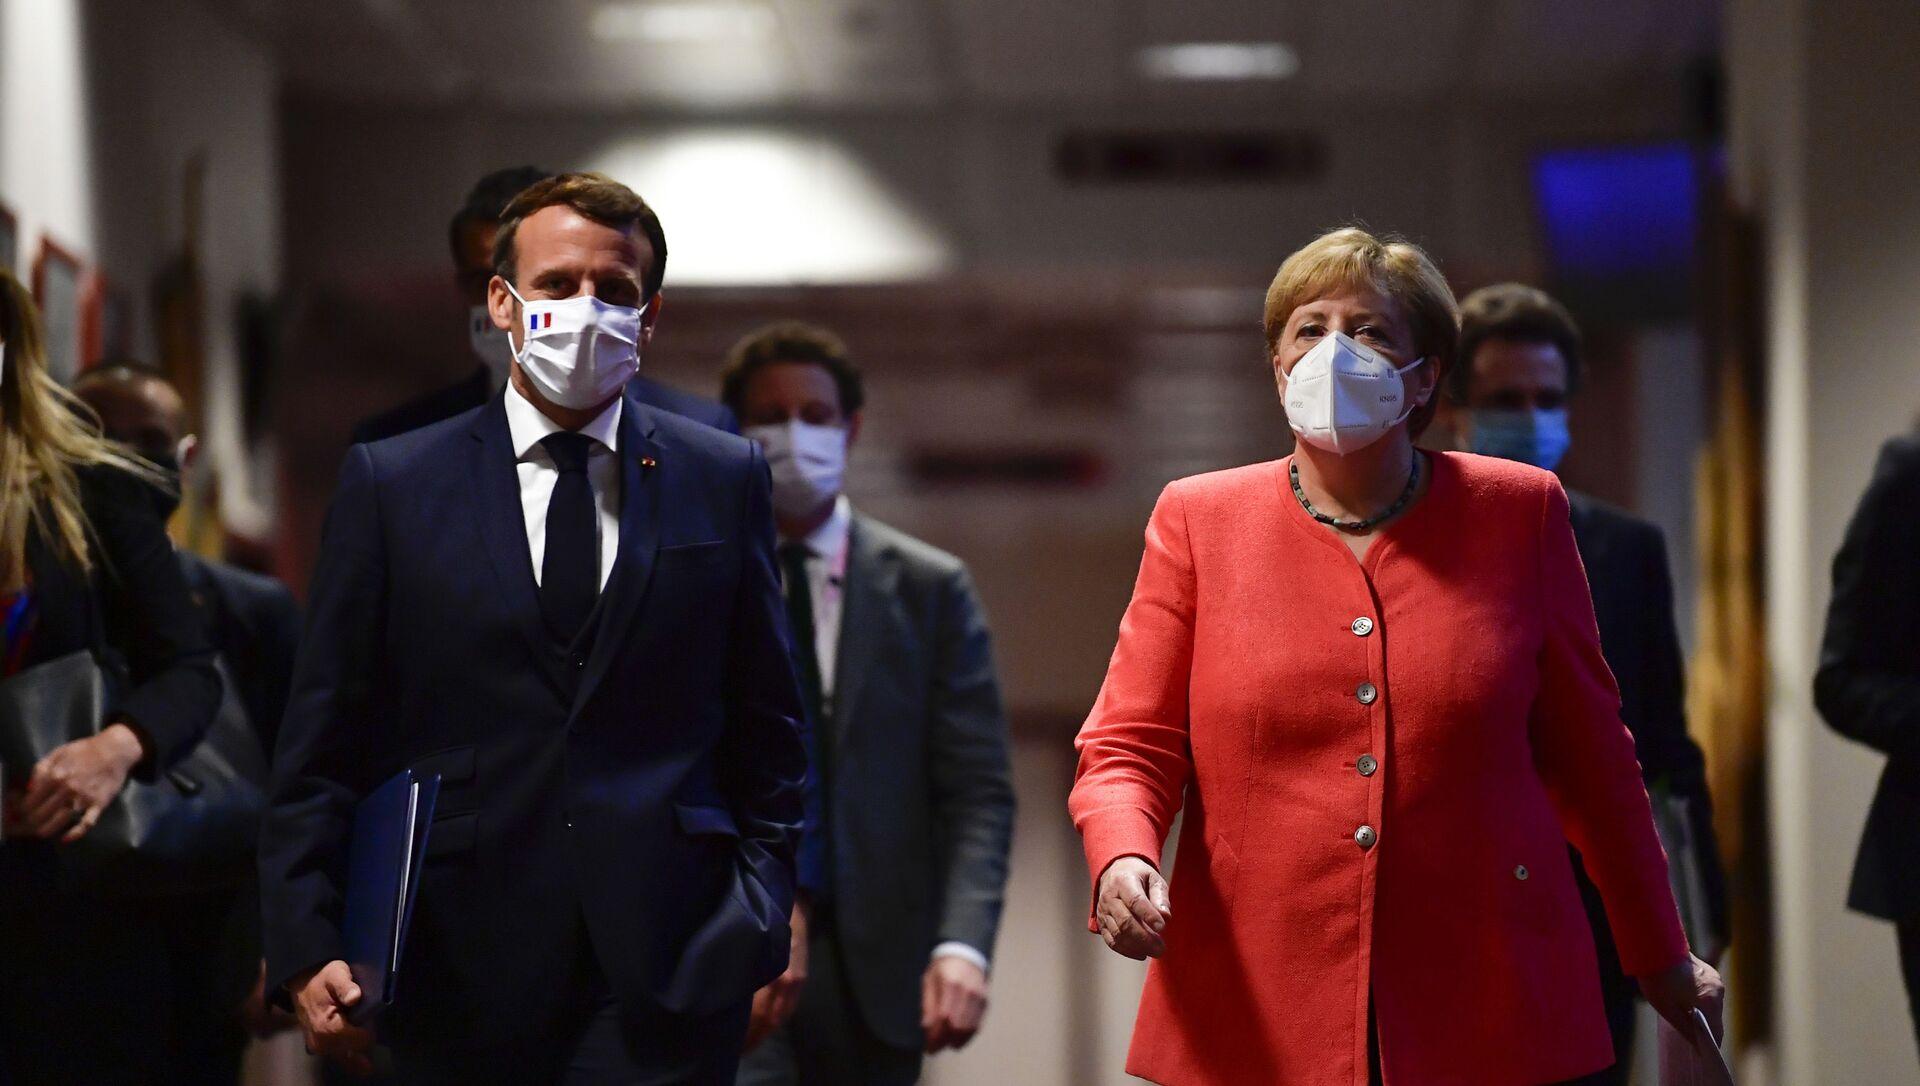 Emmanuel Macron et Angela Merkel (photo d'archives) - Sputnik France, 1920, 16.09.2021